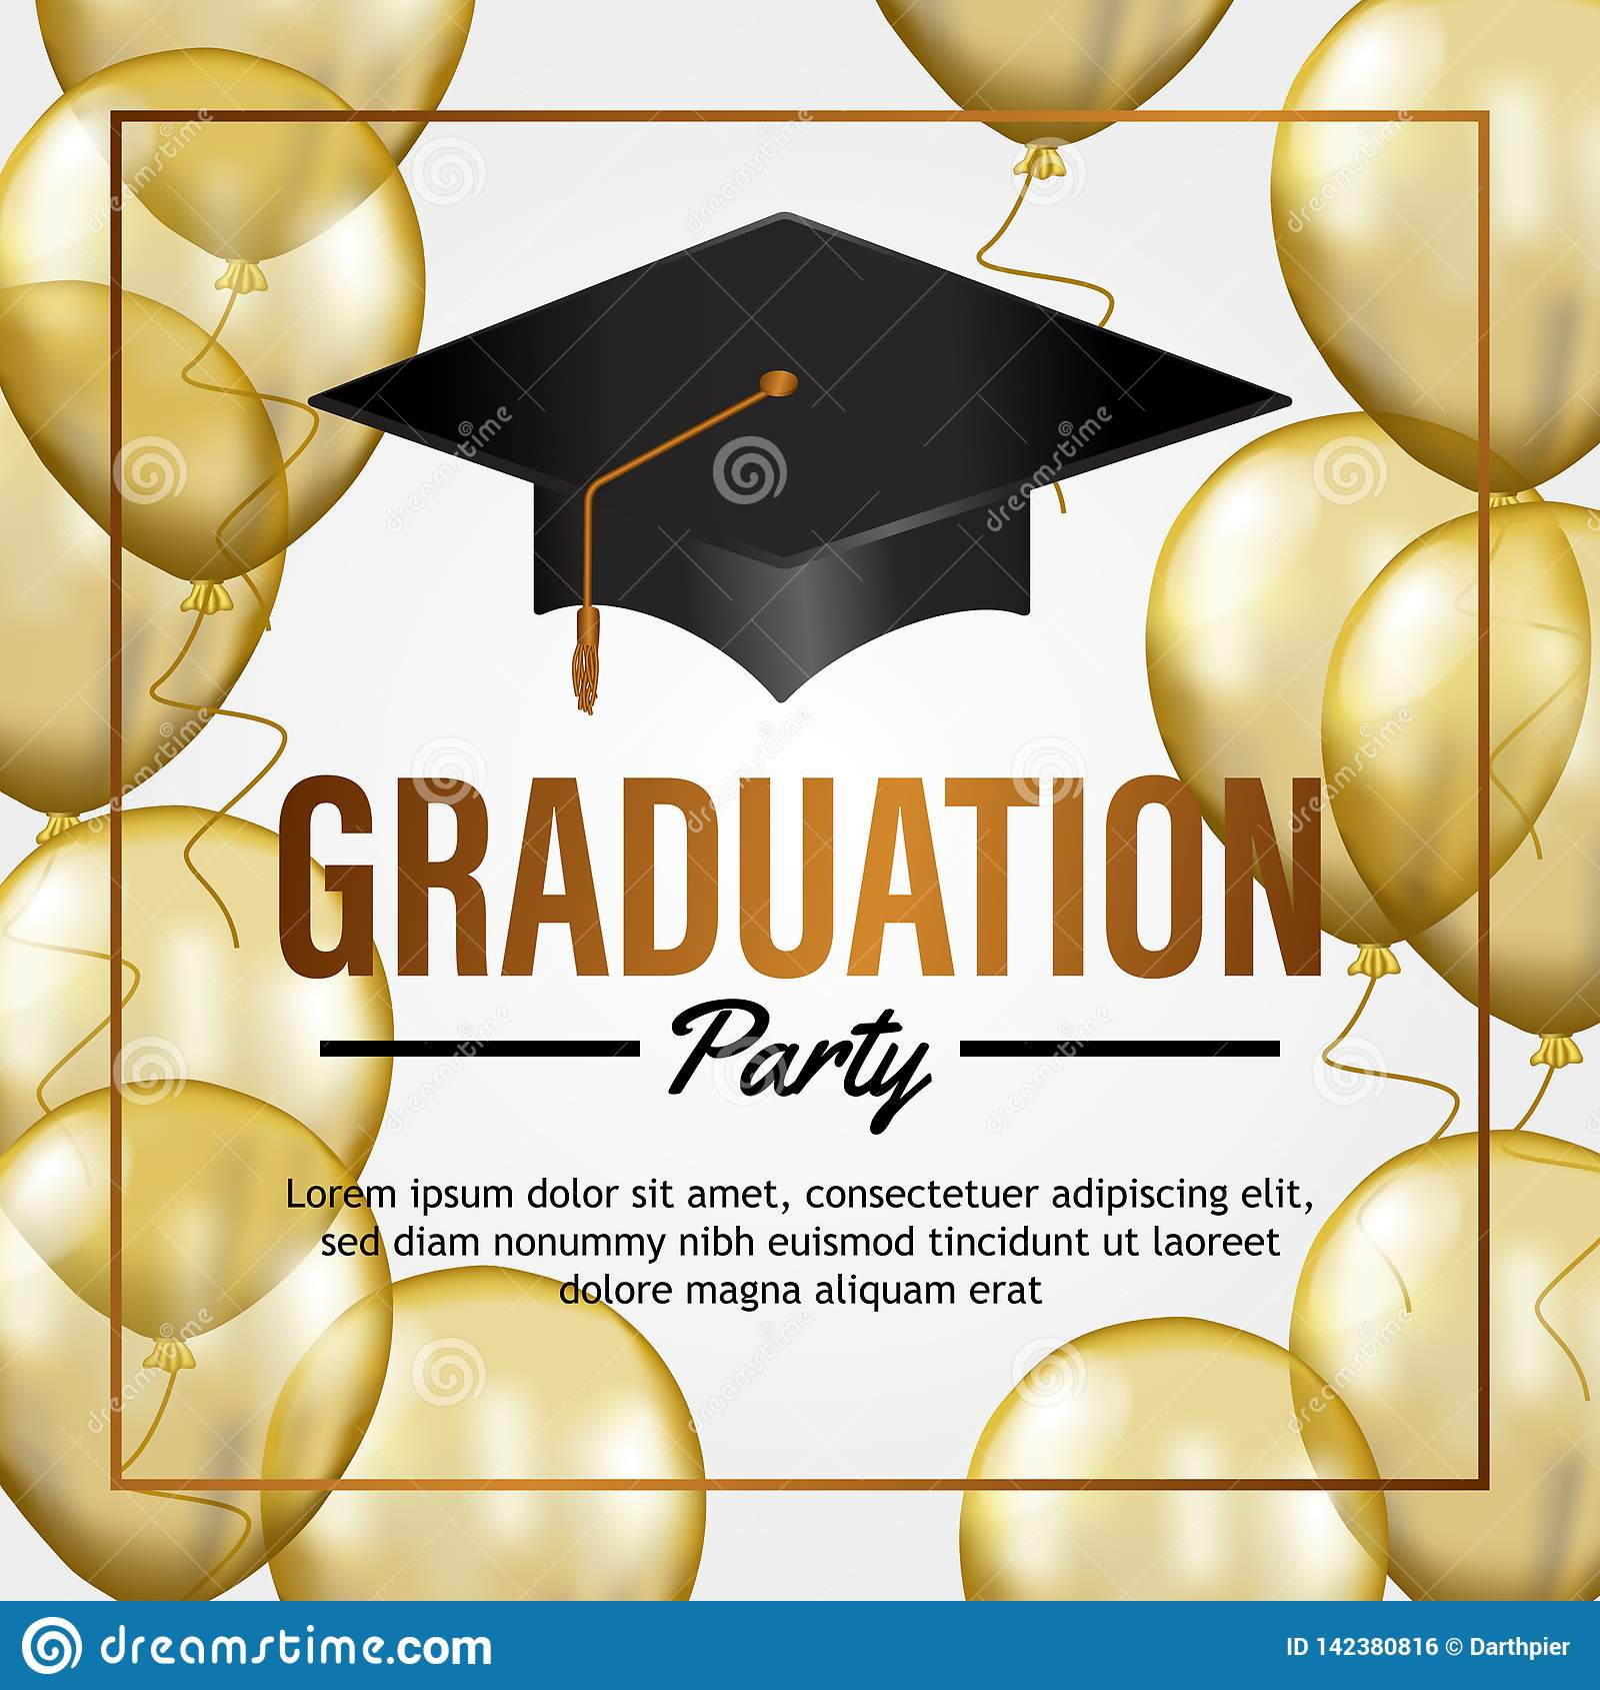 https www dreamstime com luxury graduation party invitation card transparent gold balloon hat graduate school collage celebration event poster image142380816